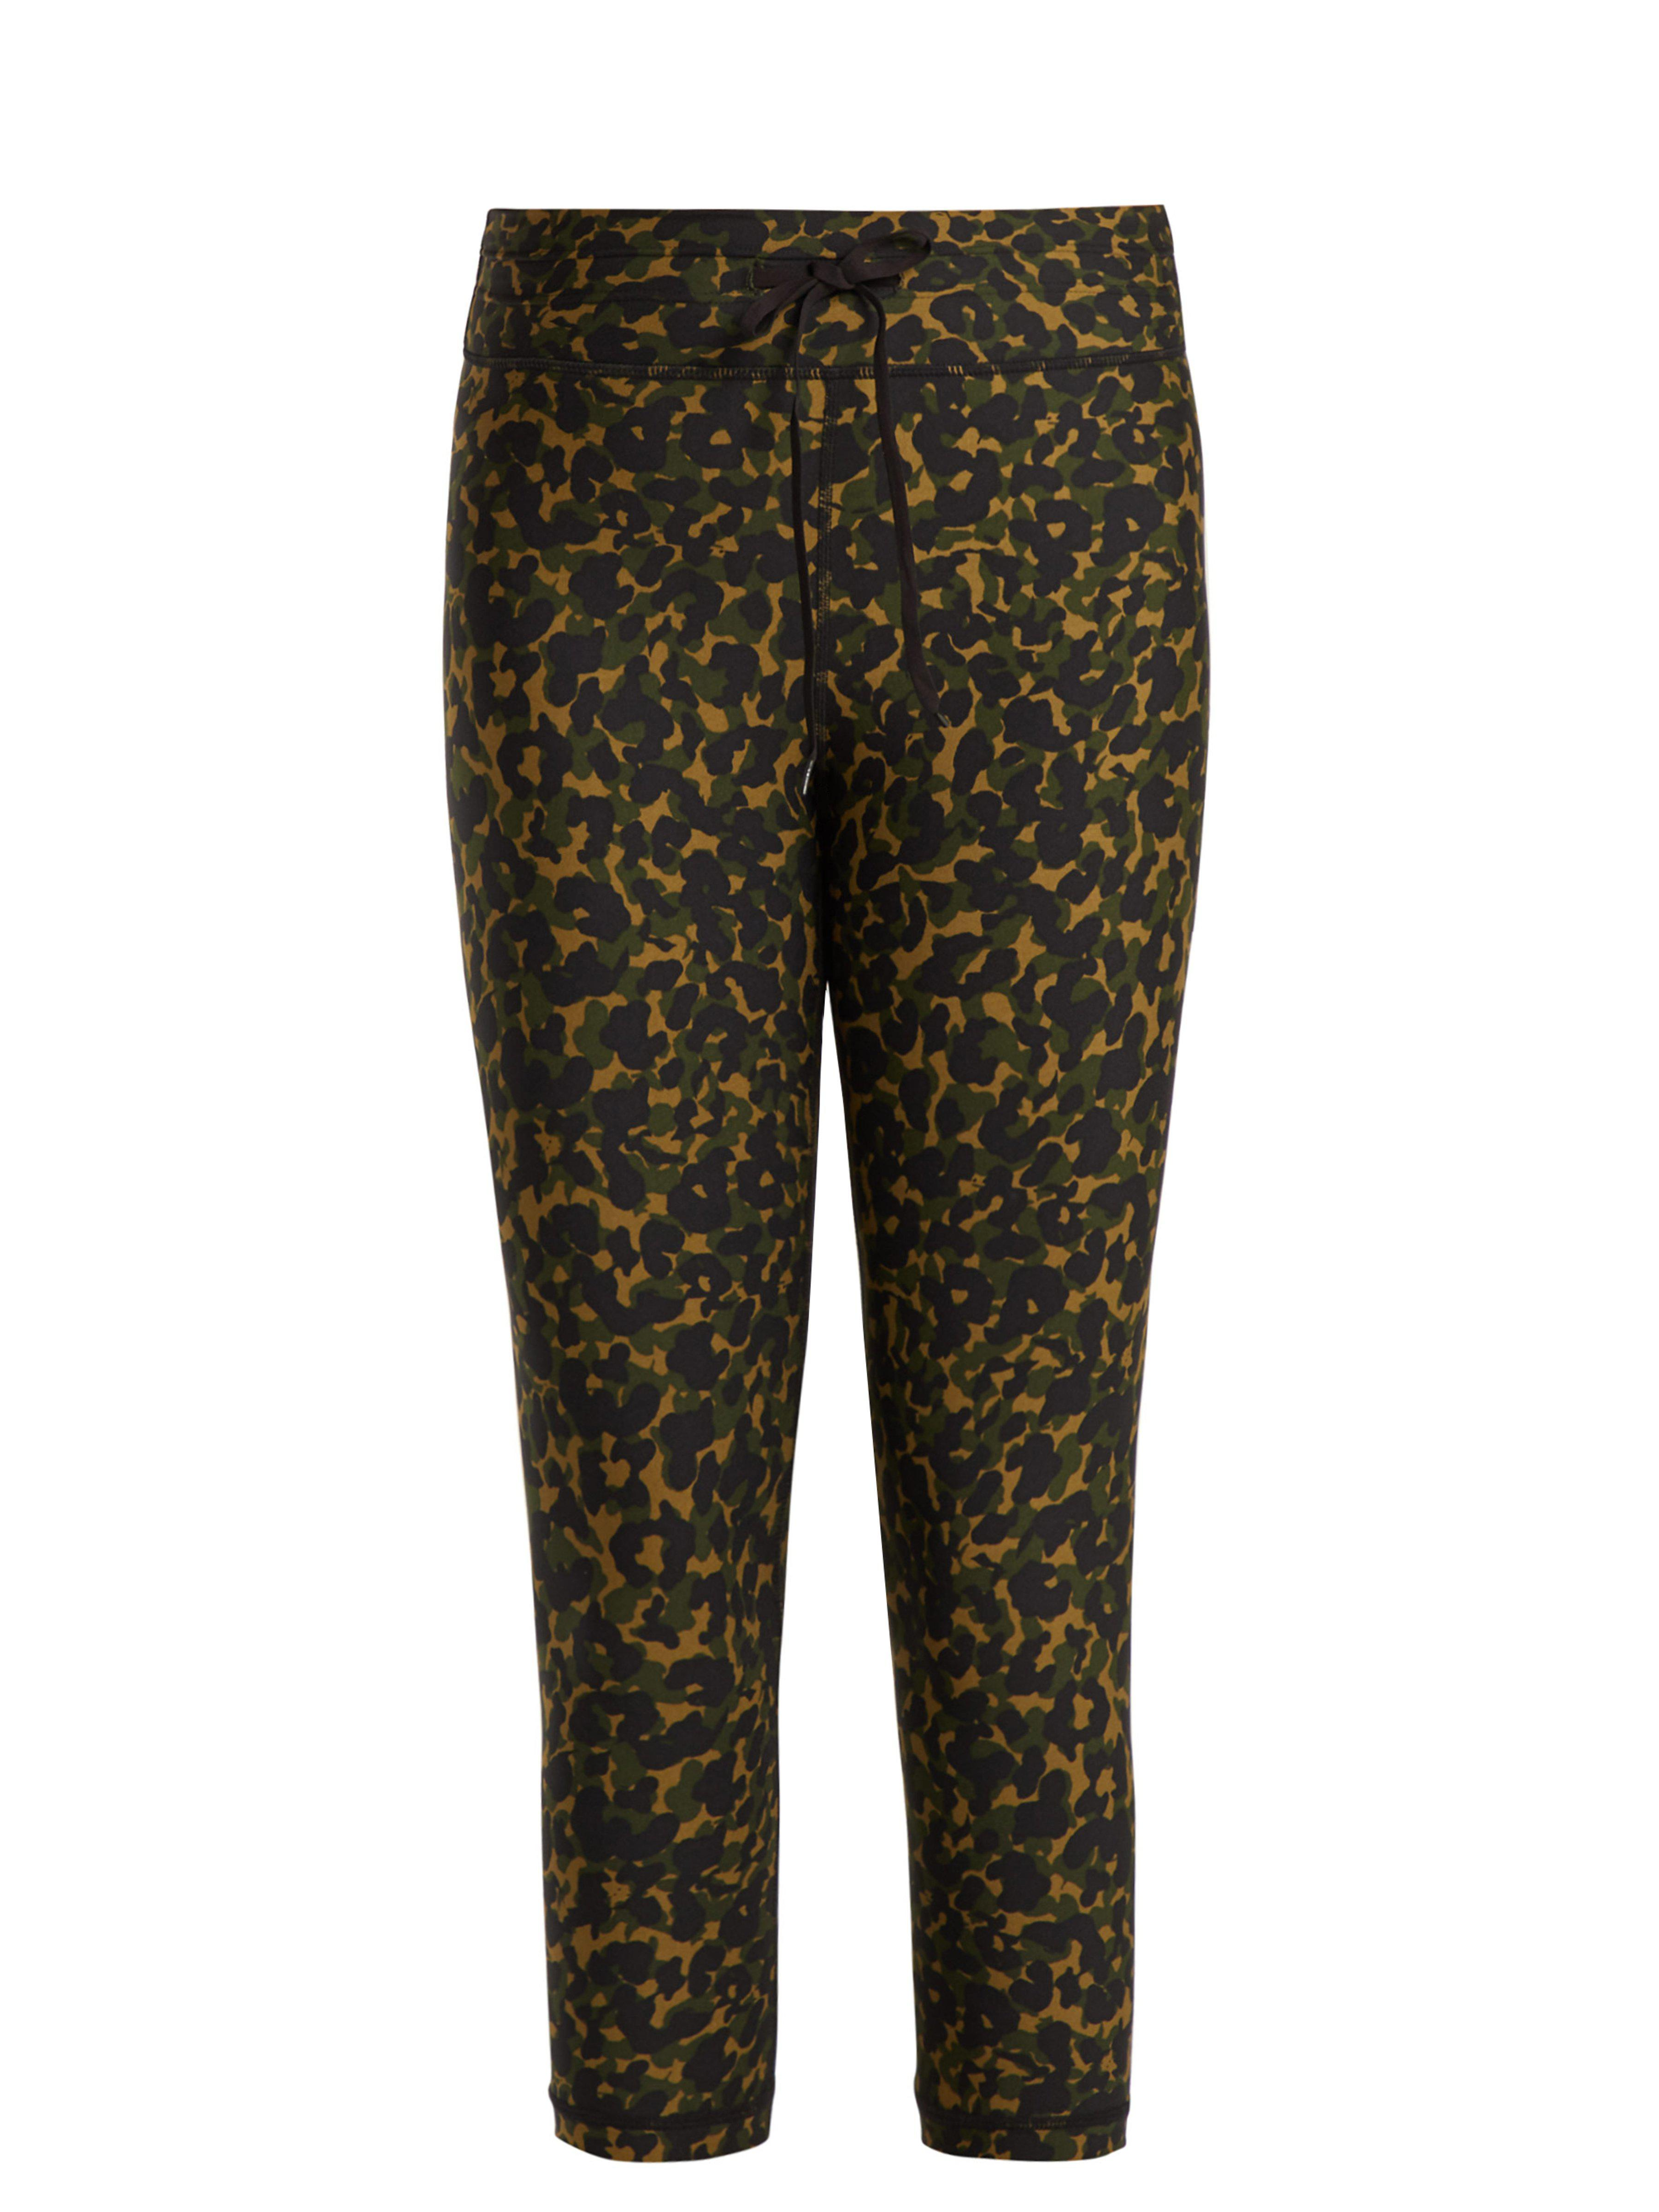 e3c1fe760c8b2 The Upside Nyc Leopard Camo Print Leggings in Green - Lyst